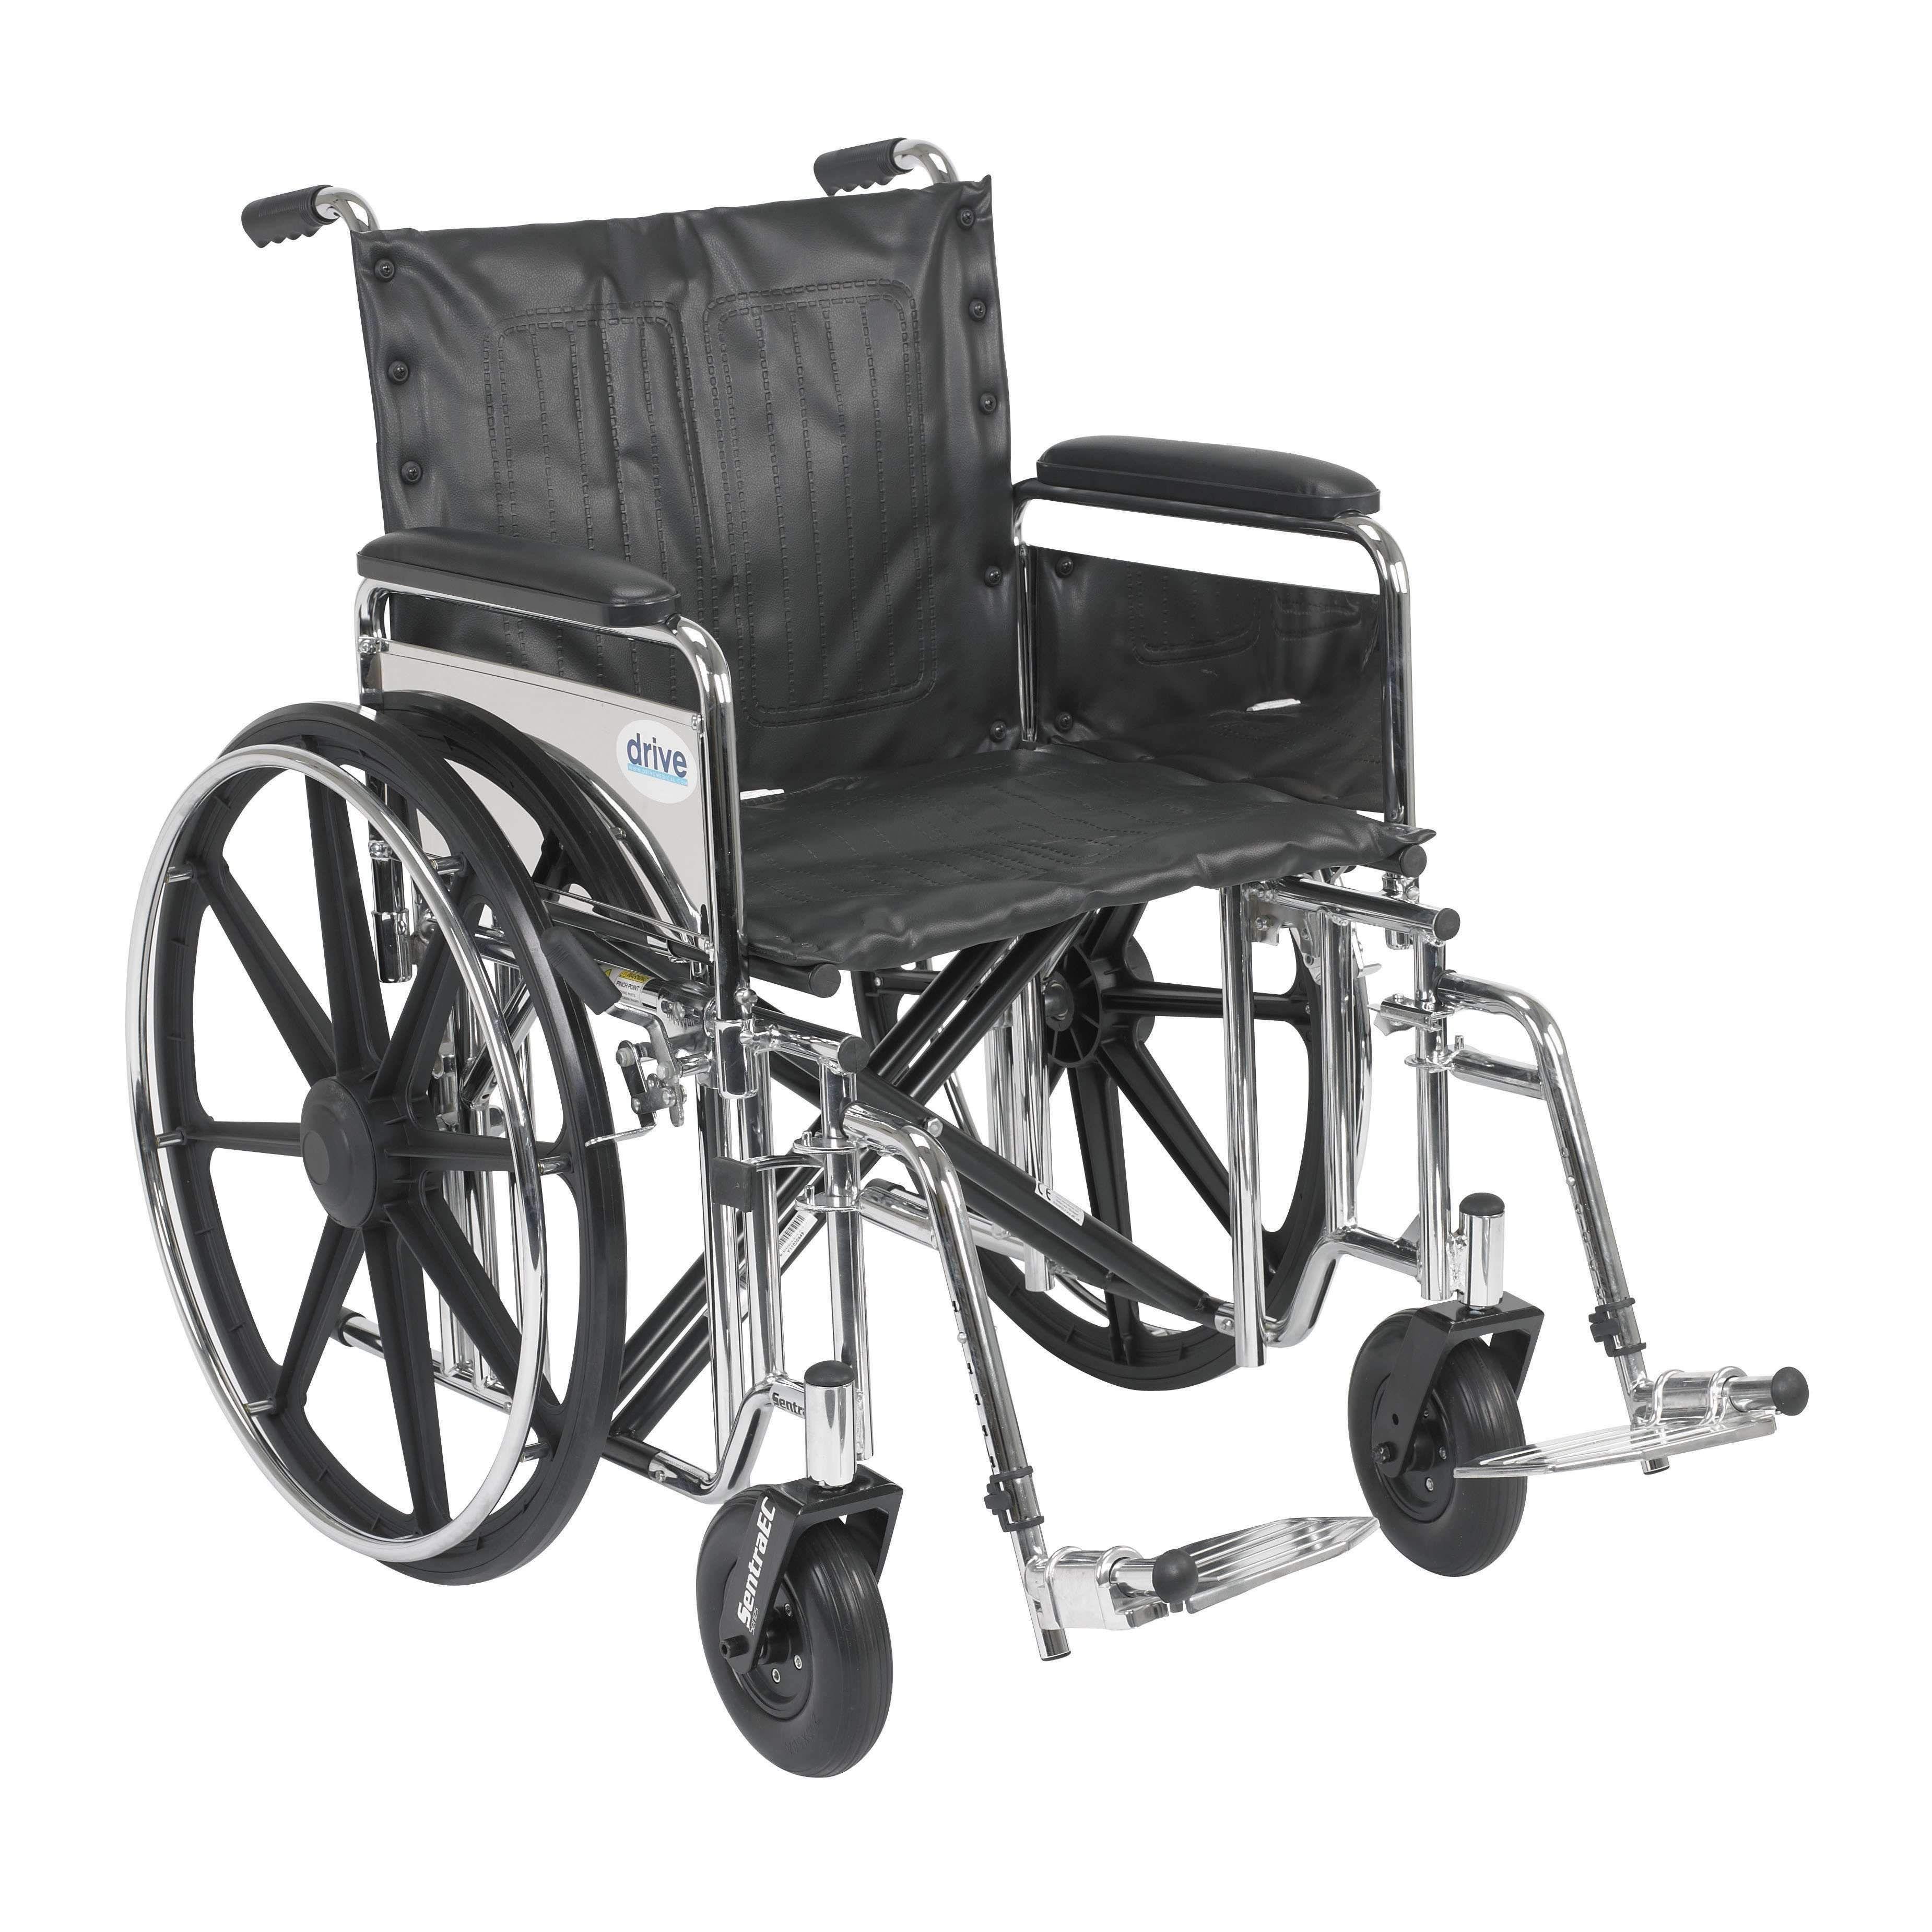 drive std20dfa sf sentra extra heavy duty wheelchair detachable rh pinterest com All Terrain Manual Wheelchairs medicare lcd manual wheelchairs